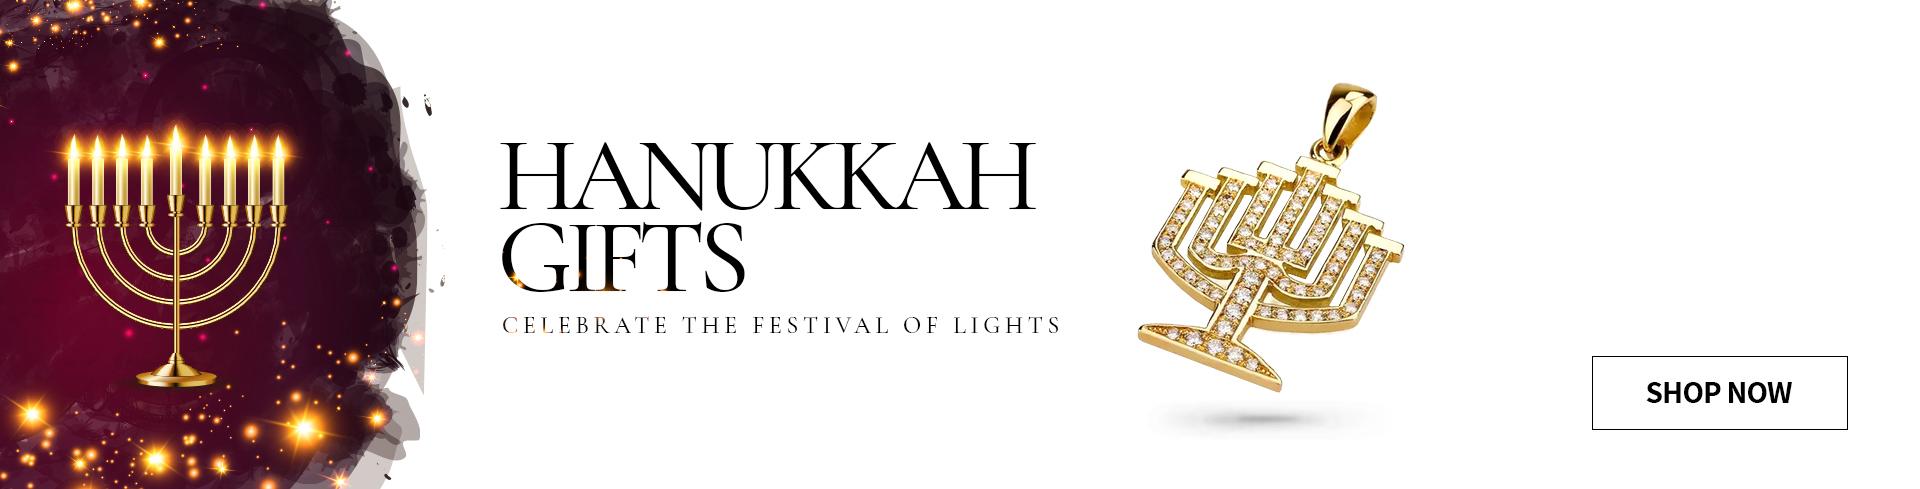 Hanukkah – Desktop Banner